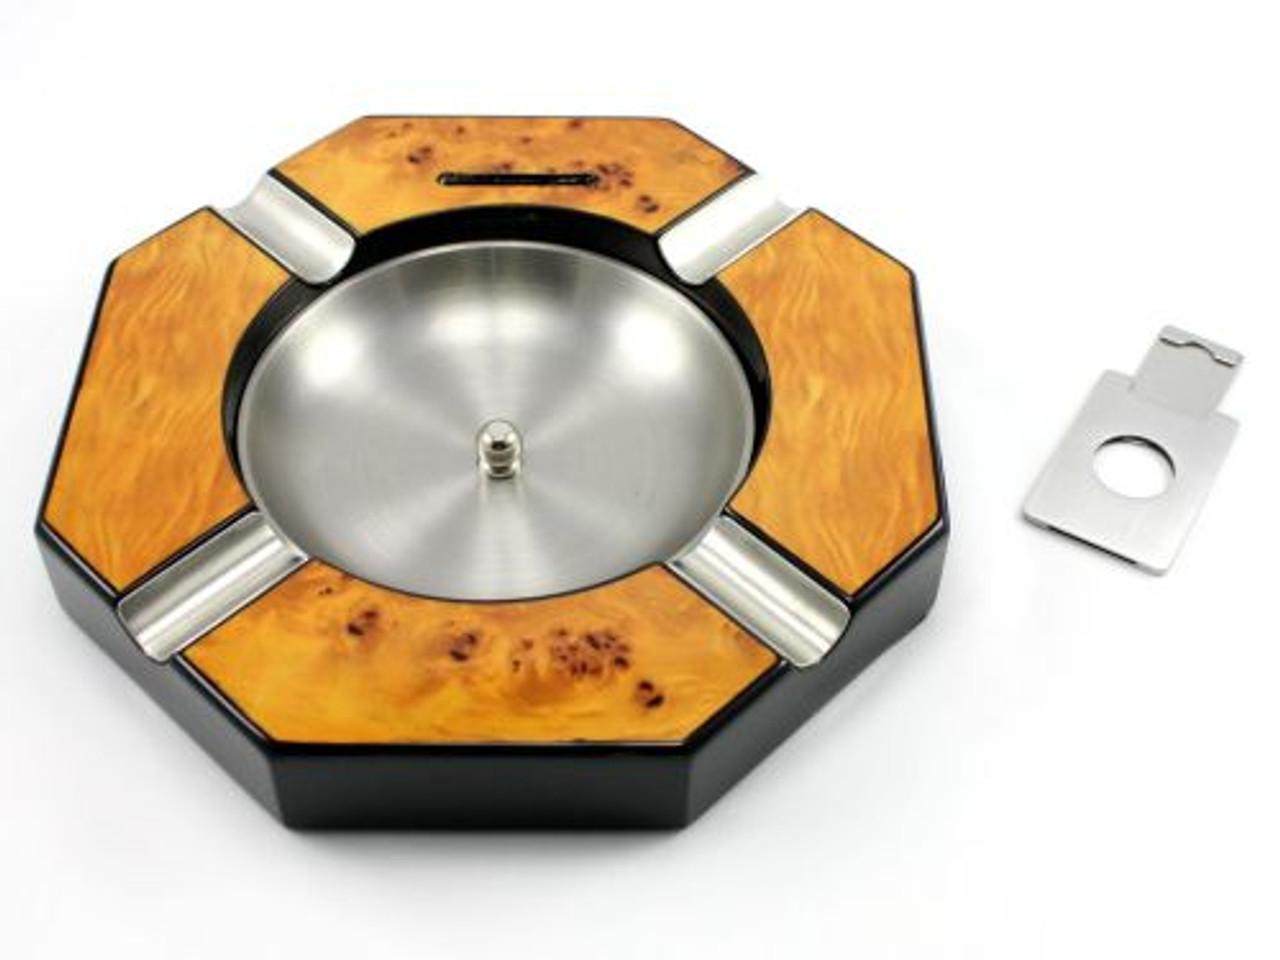 Kenyon Cigar Ashtray with Cutter